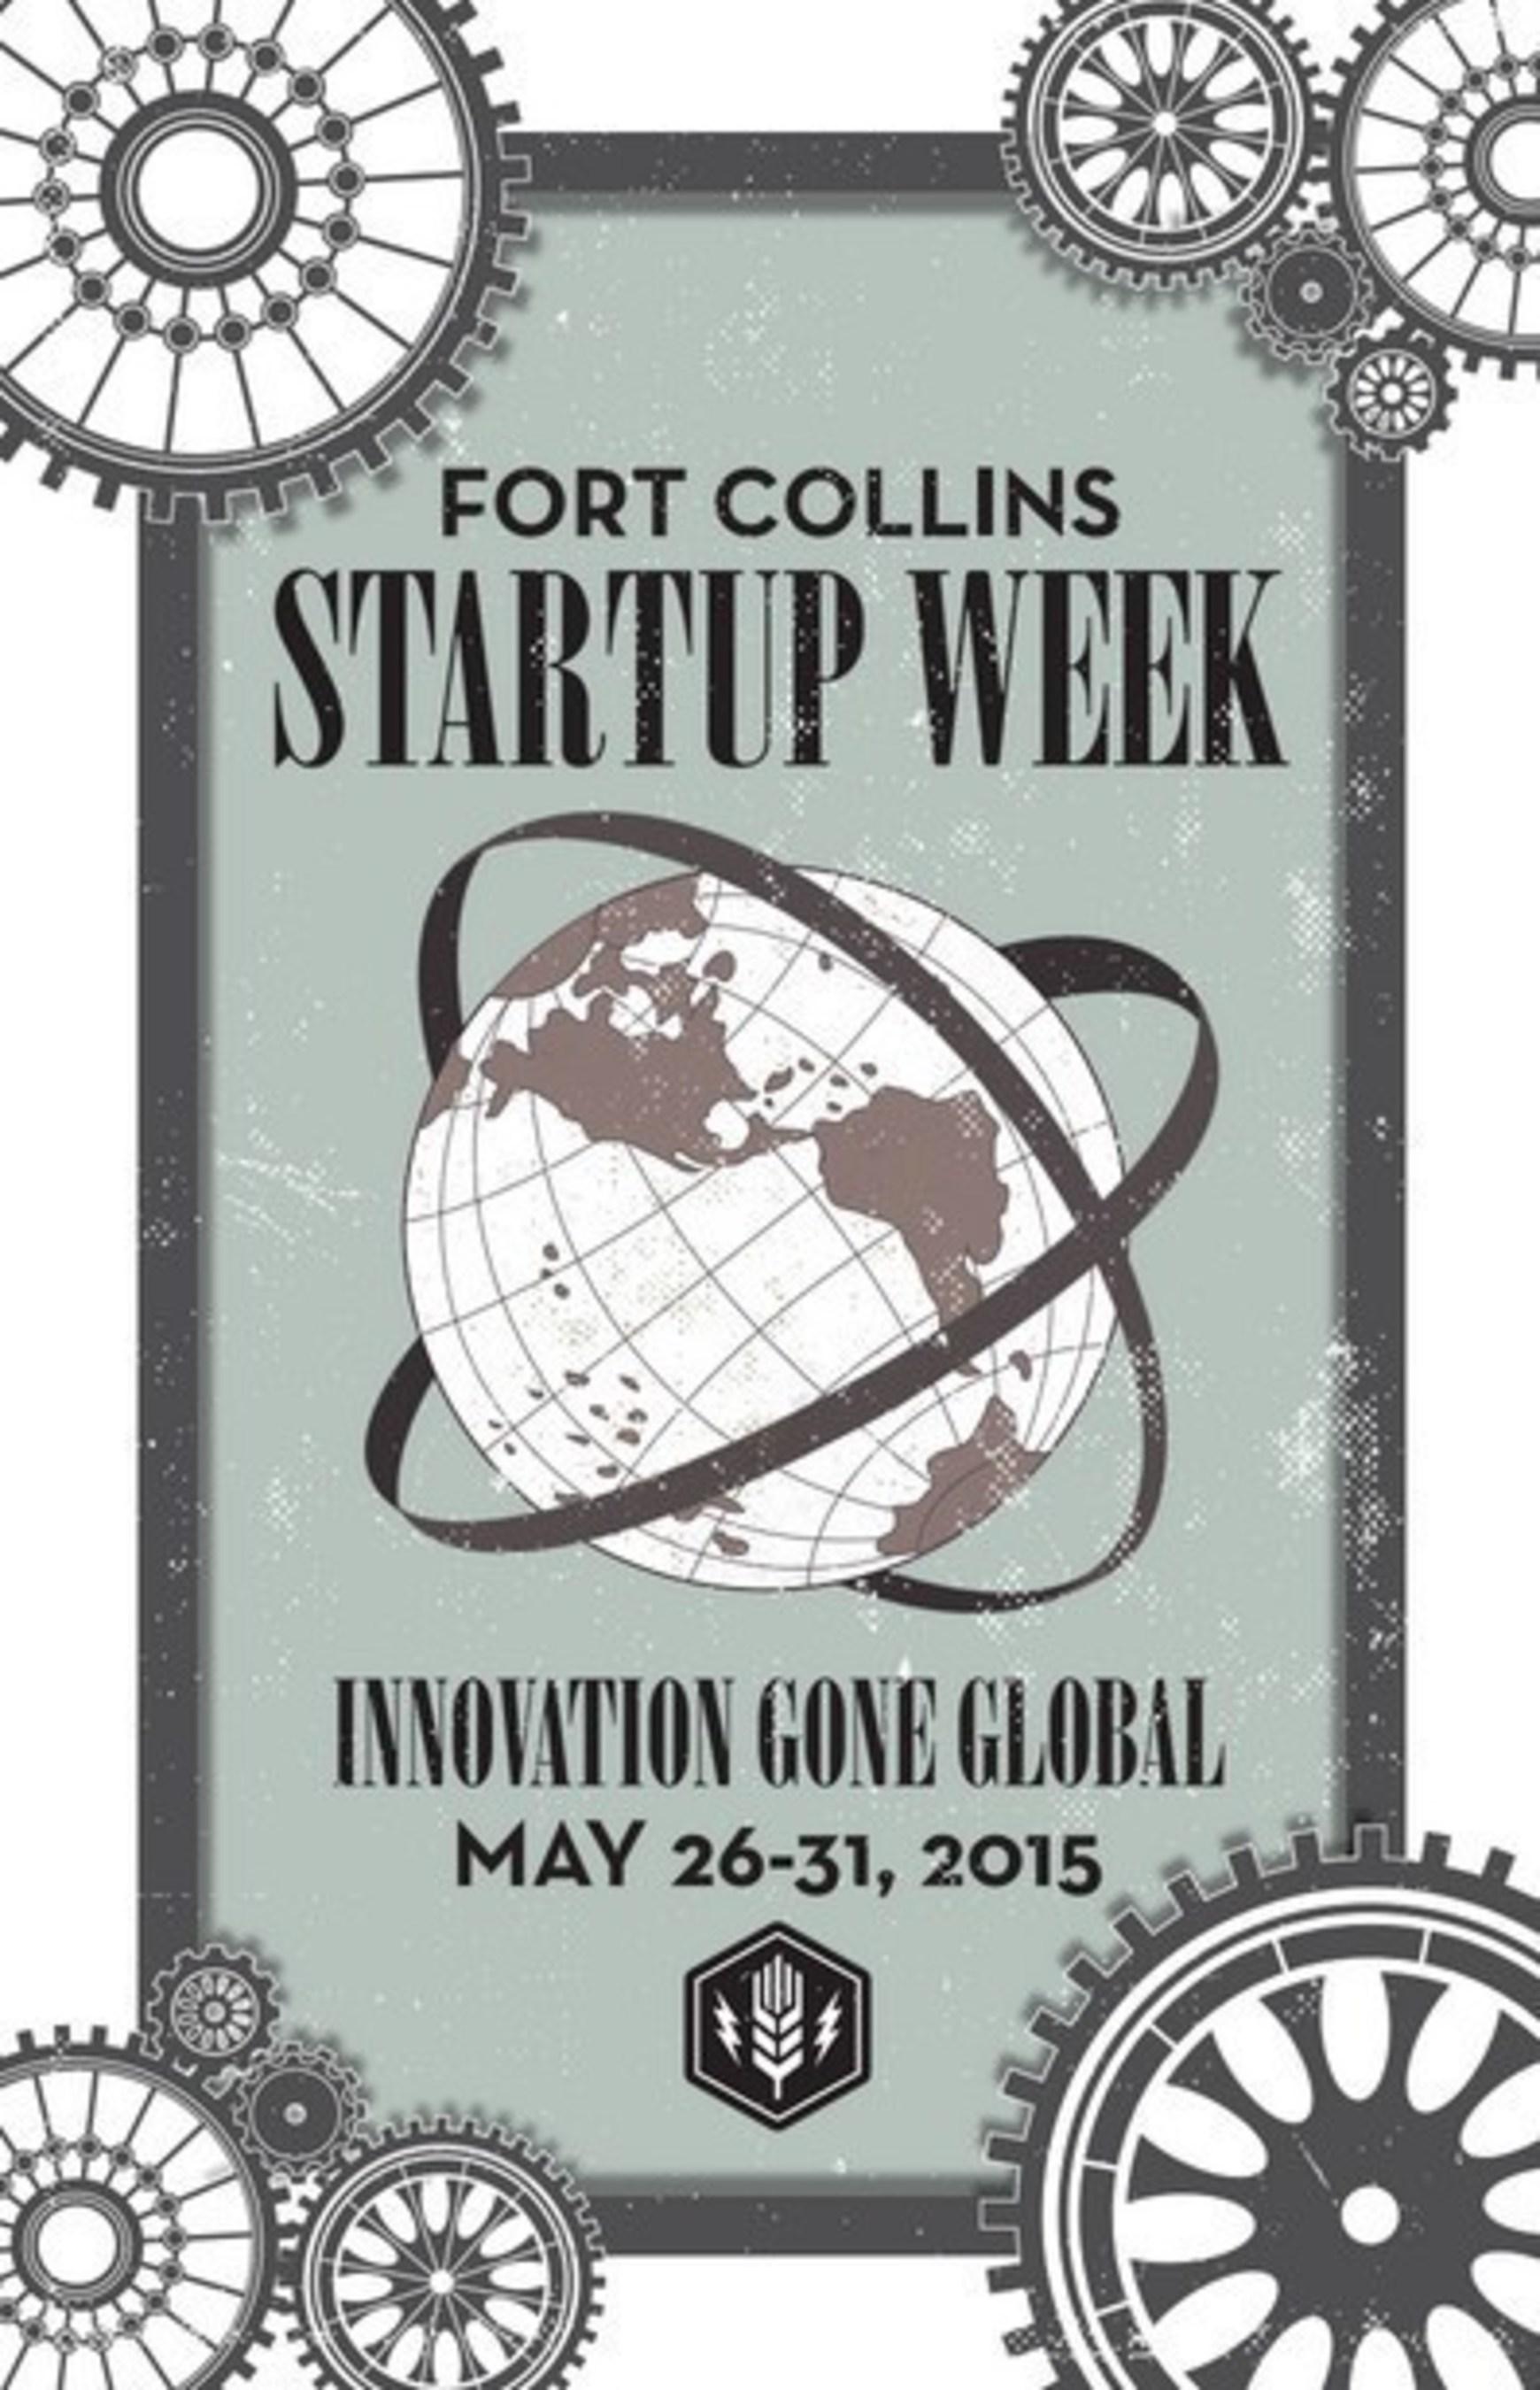 Innovation Gone Global #FCSW15